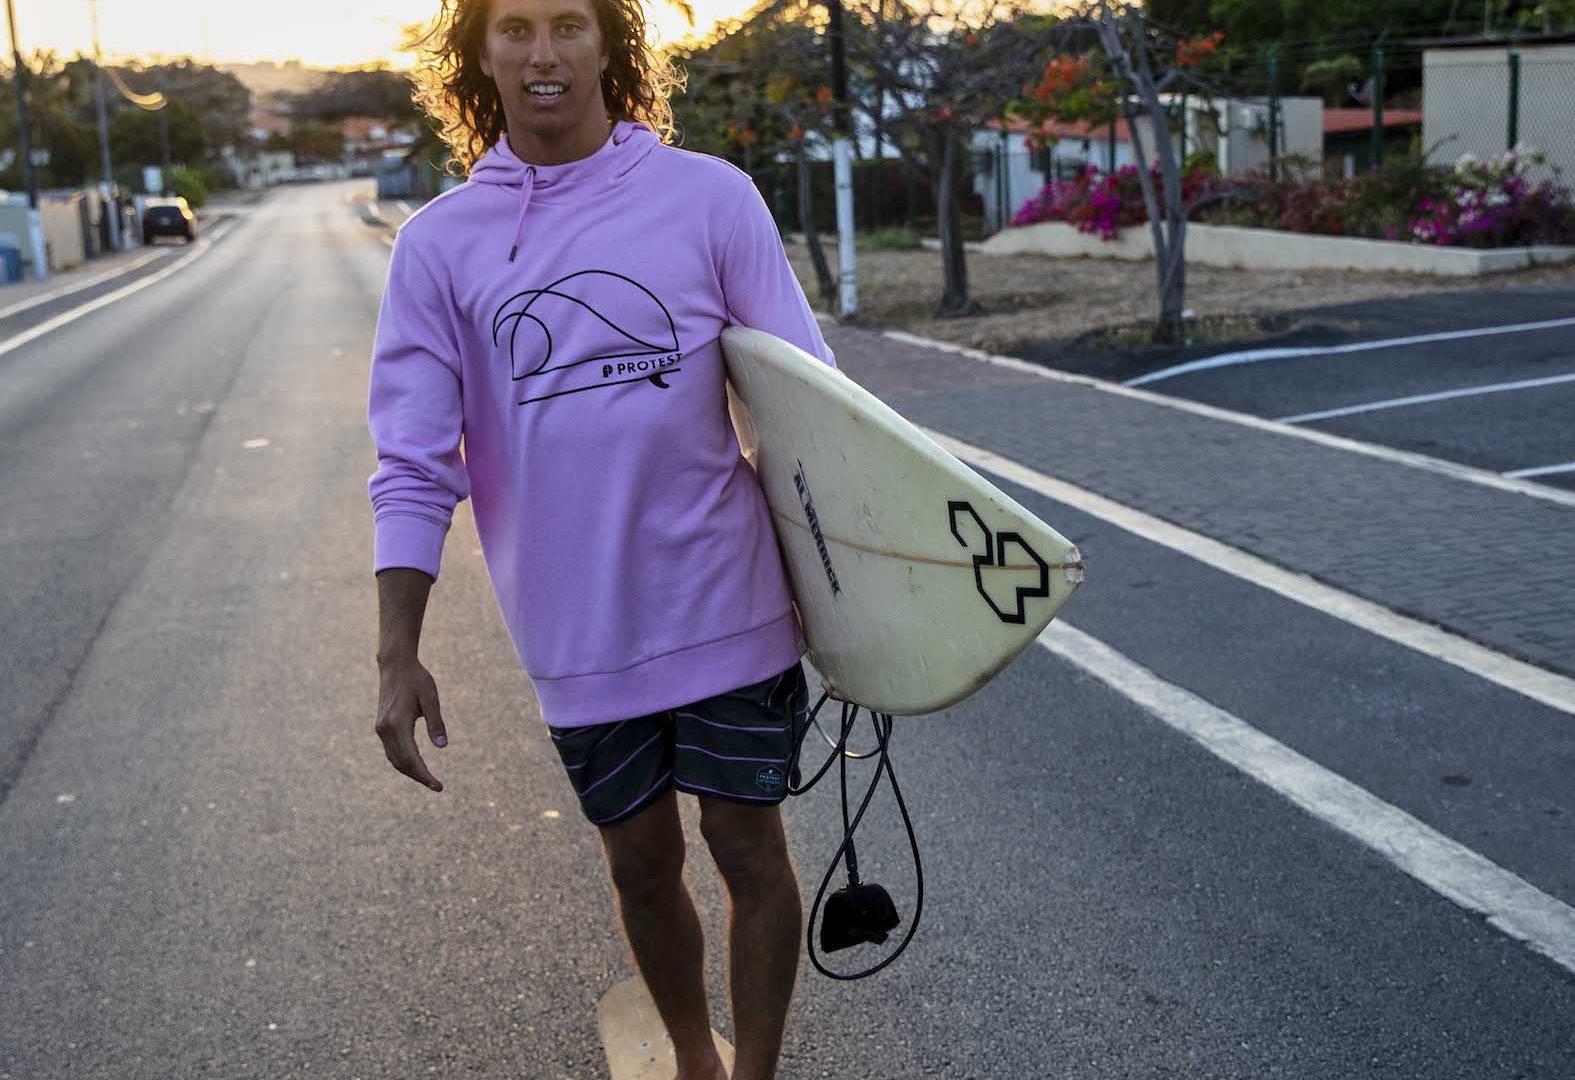 Protest SS20 Men's Surf Wear